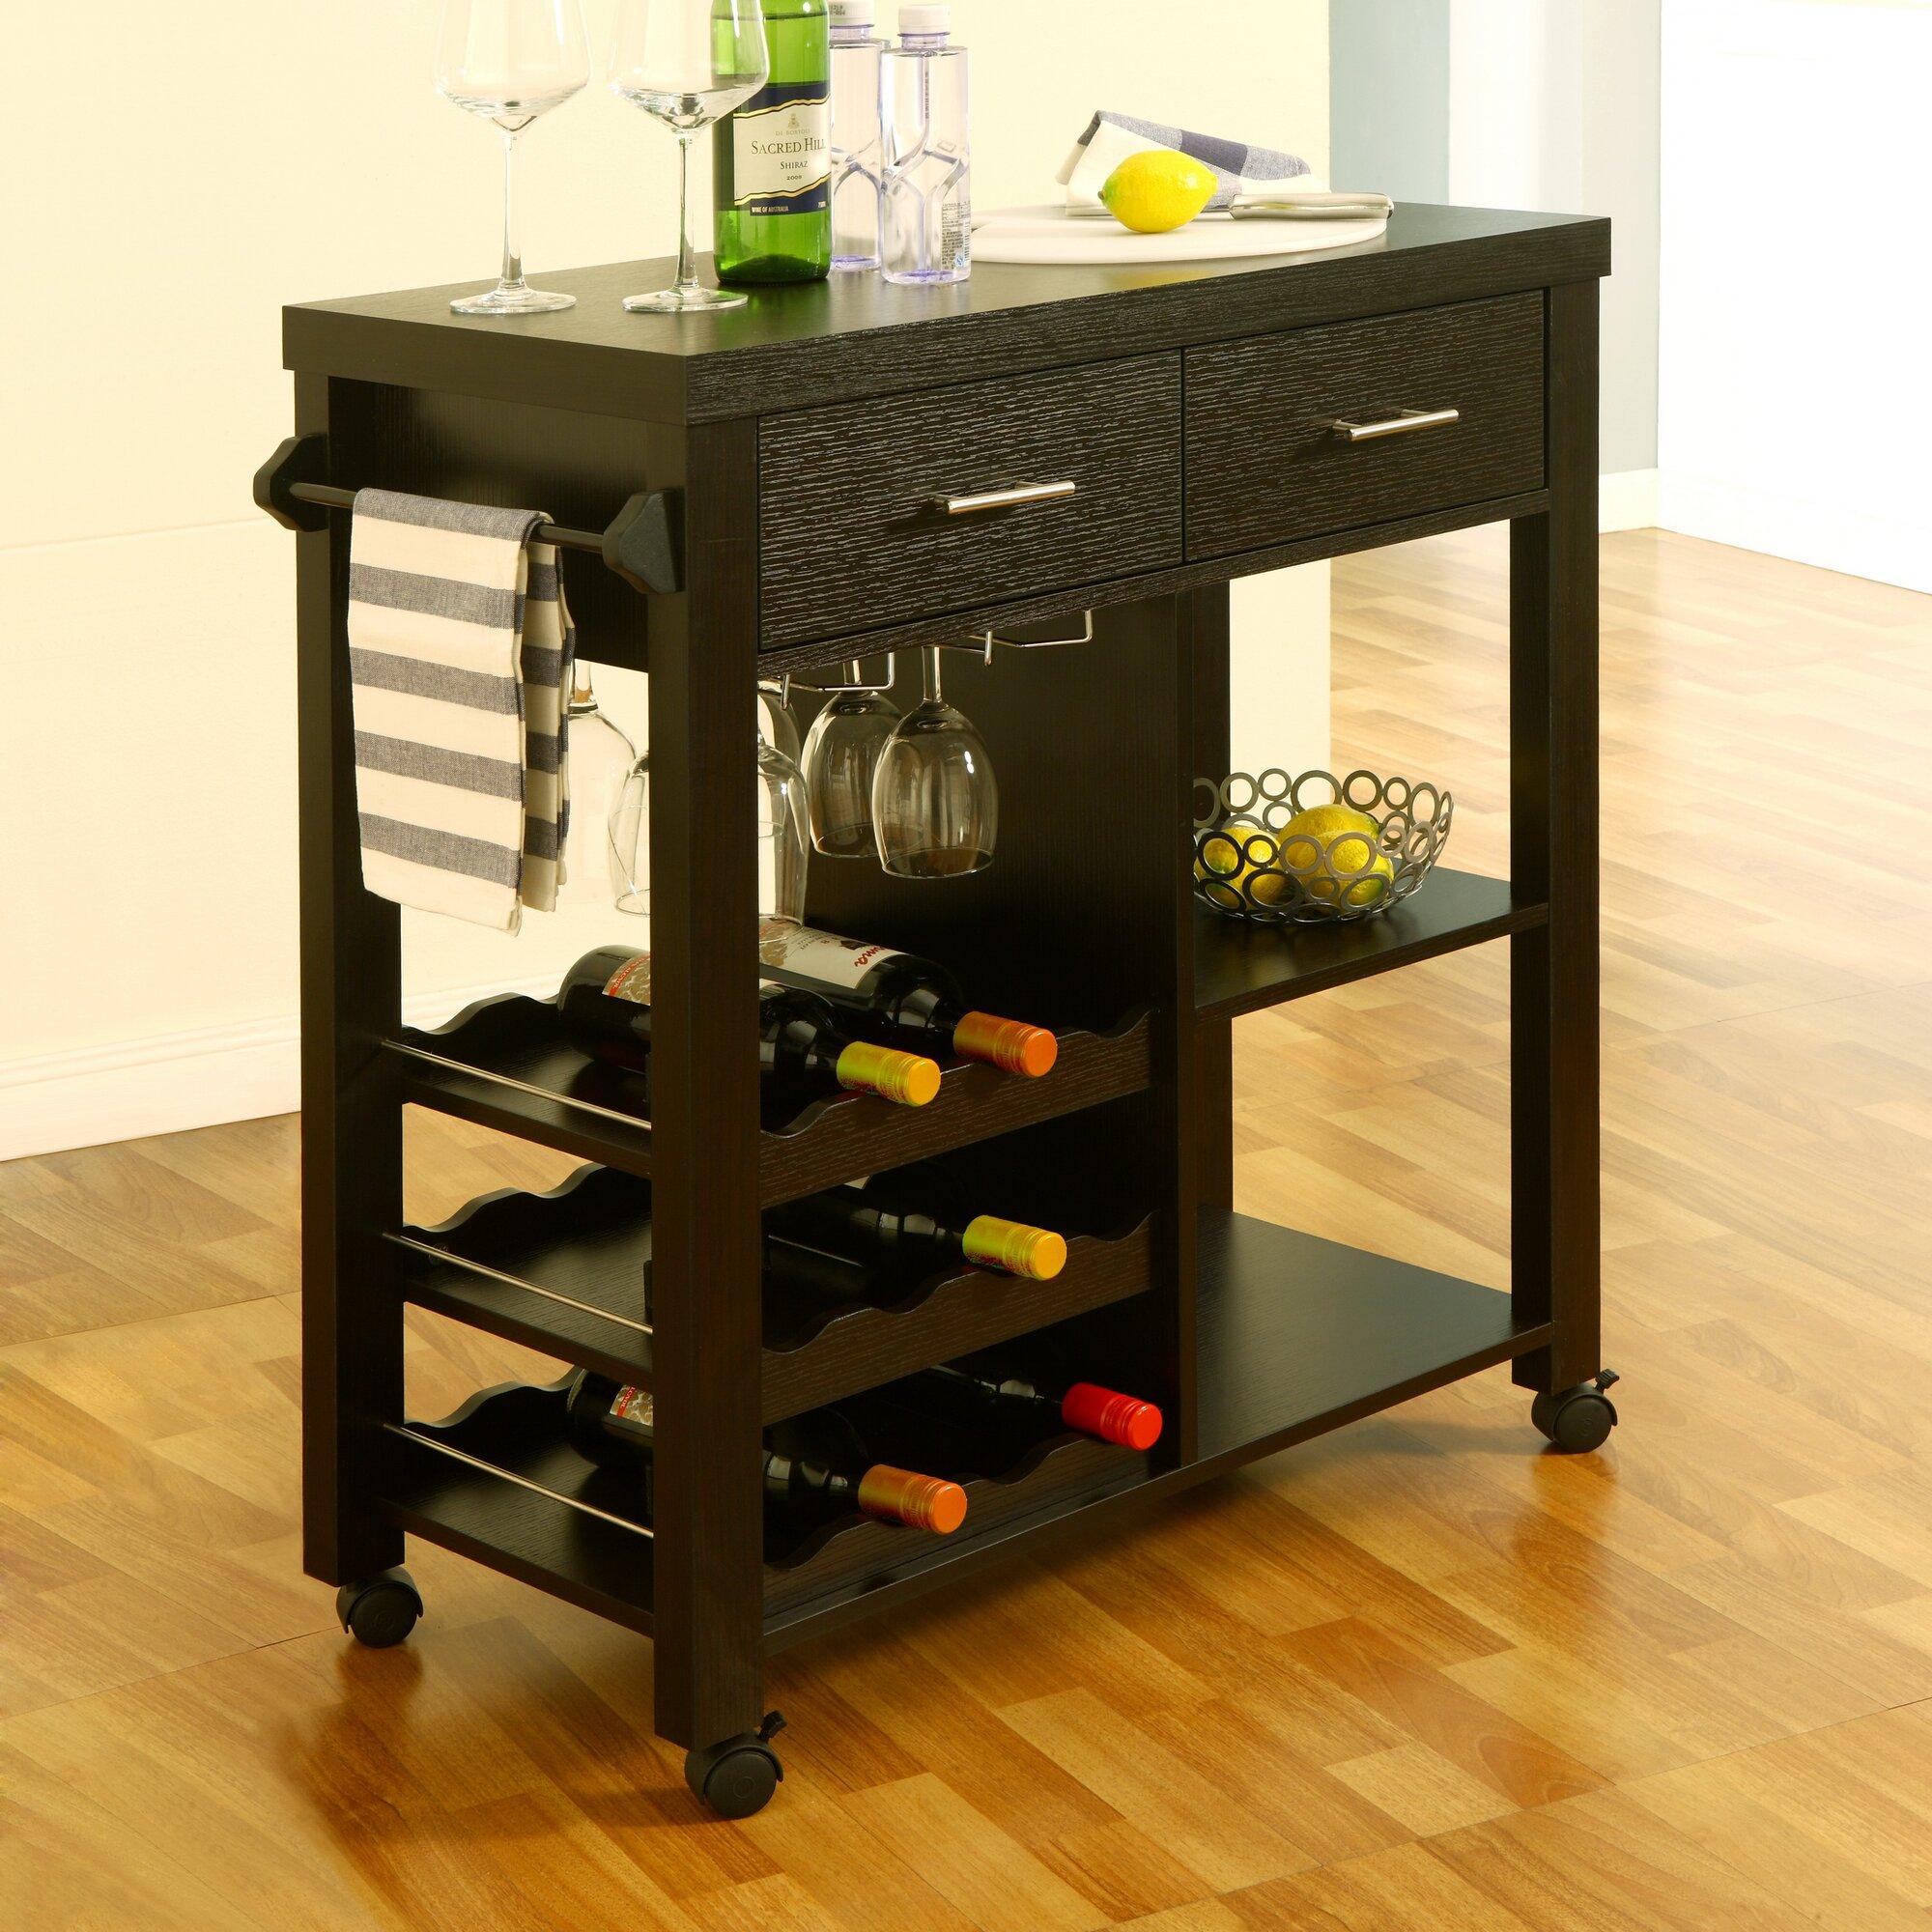 Zayley Case Bed Signature Design Furniture Cart